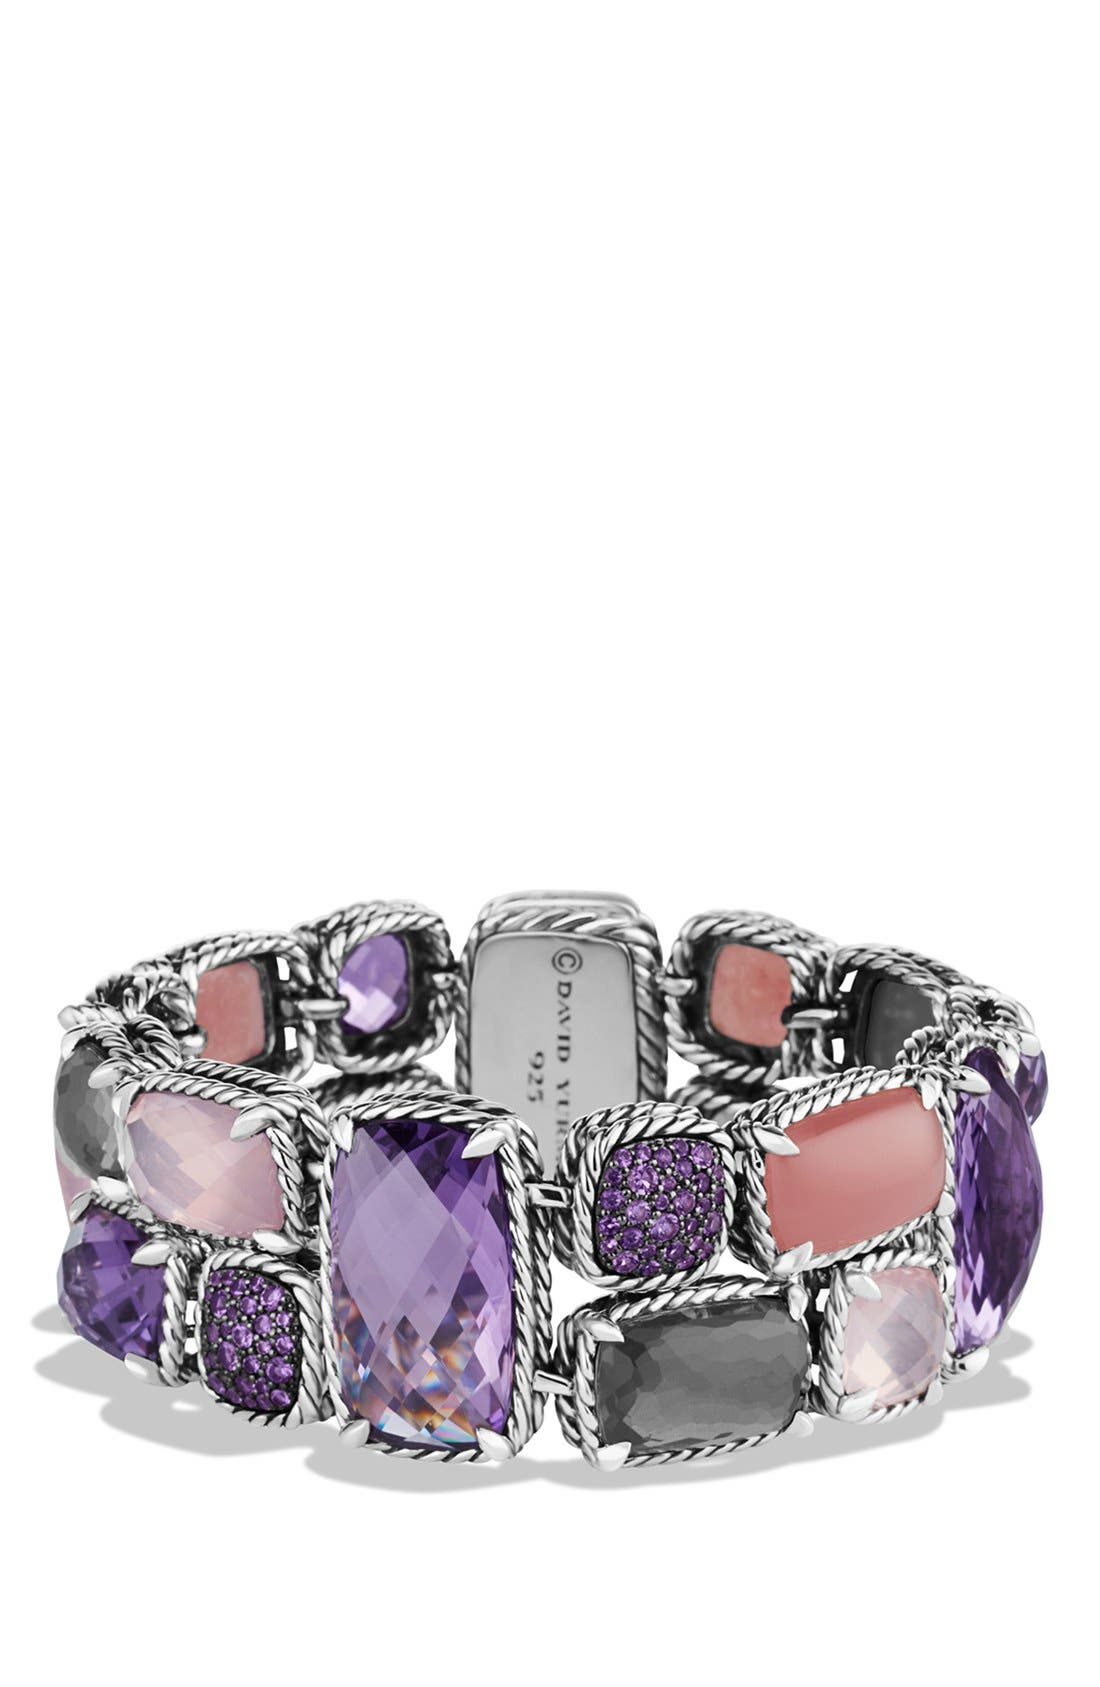 Main Image - David Yurman 'Mosaic - Châtelaine' Bracelet with Semiprecious Stones